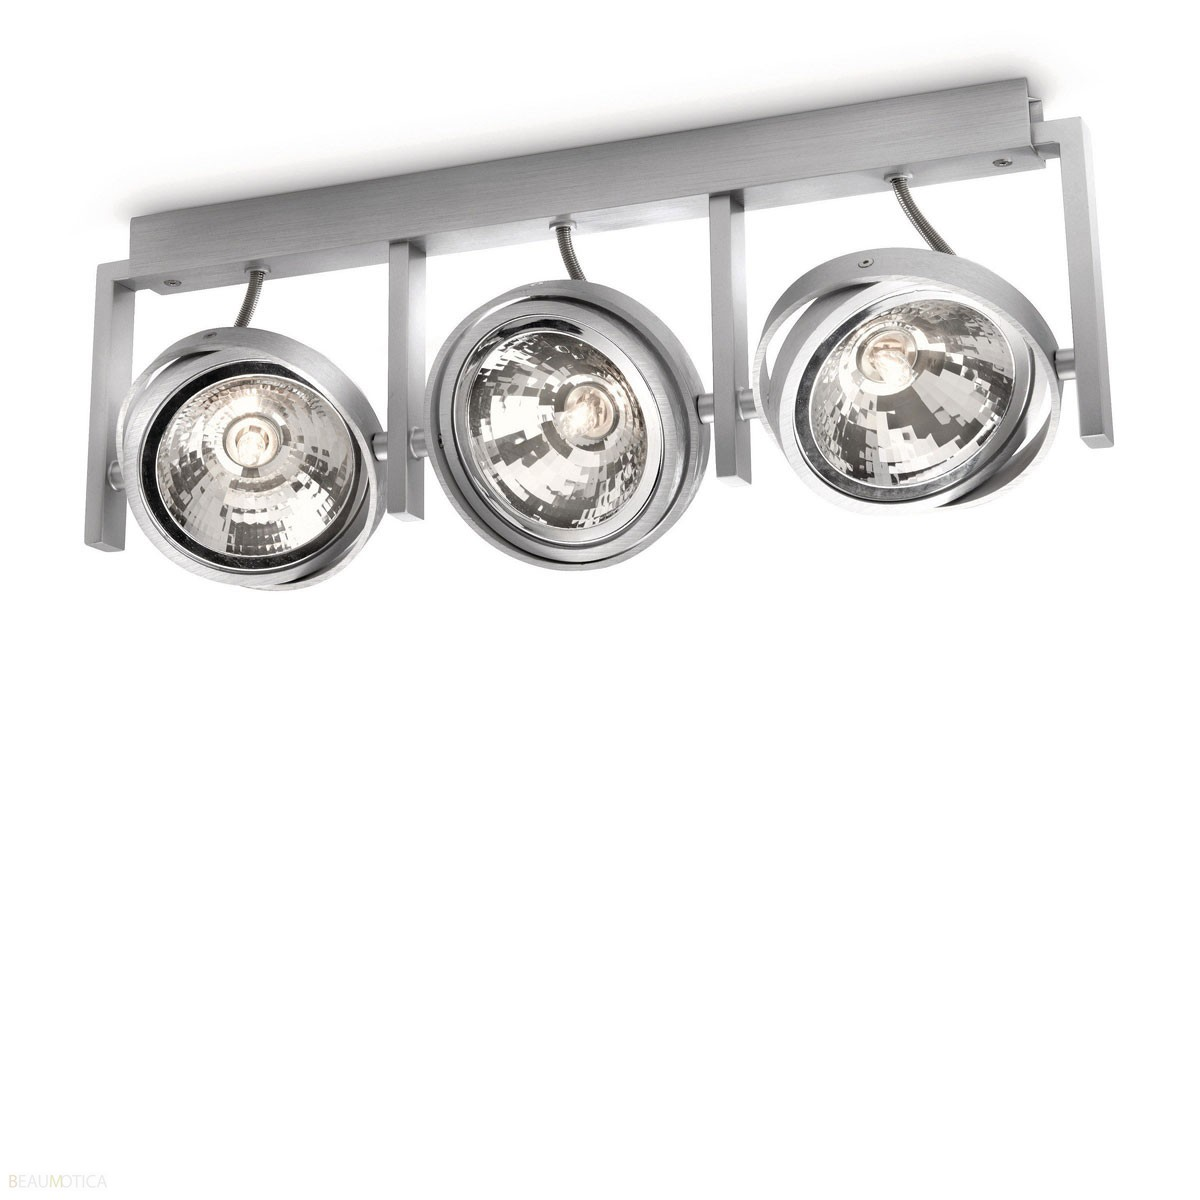 philips myliving fast spot aluminium 3 spots. Black Bedroom Furniture Sets. Home Design Ideas